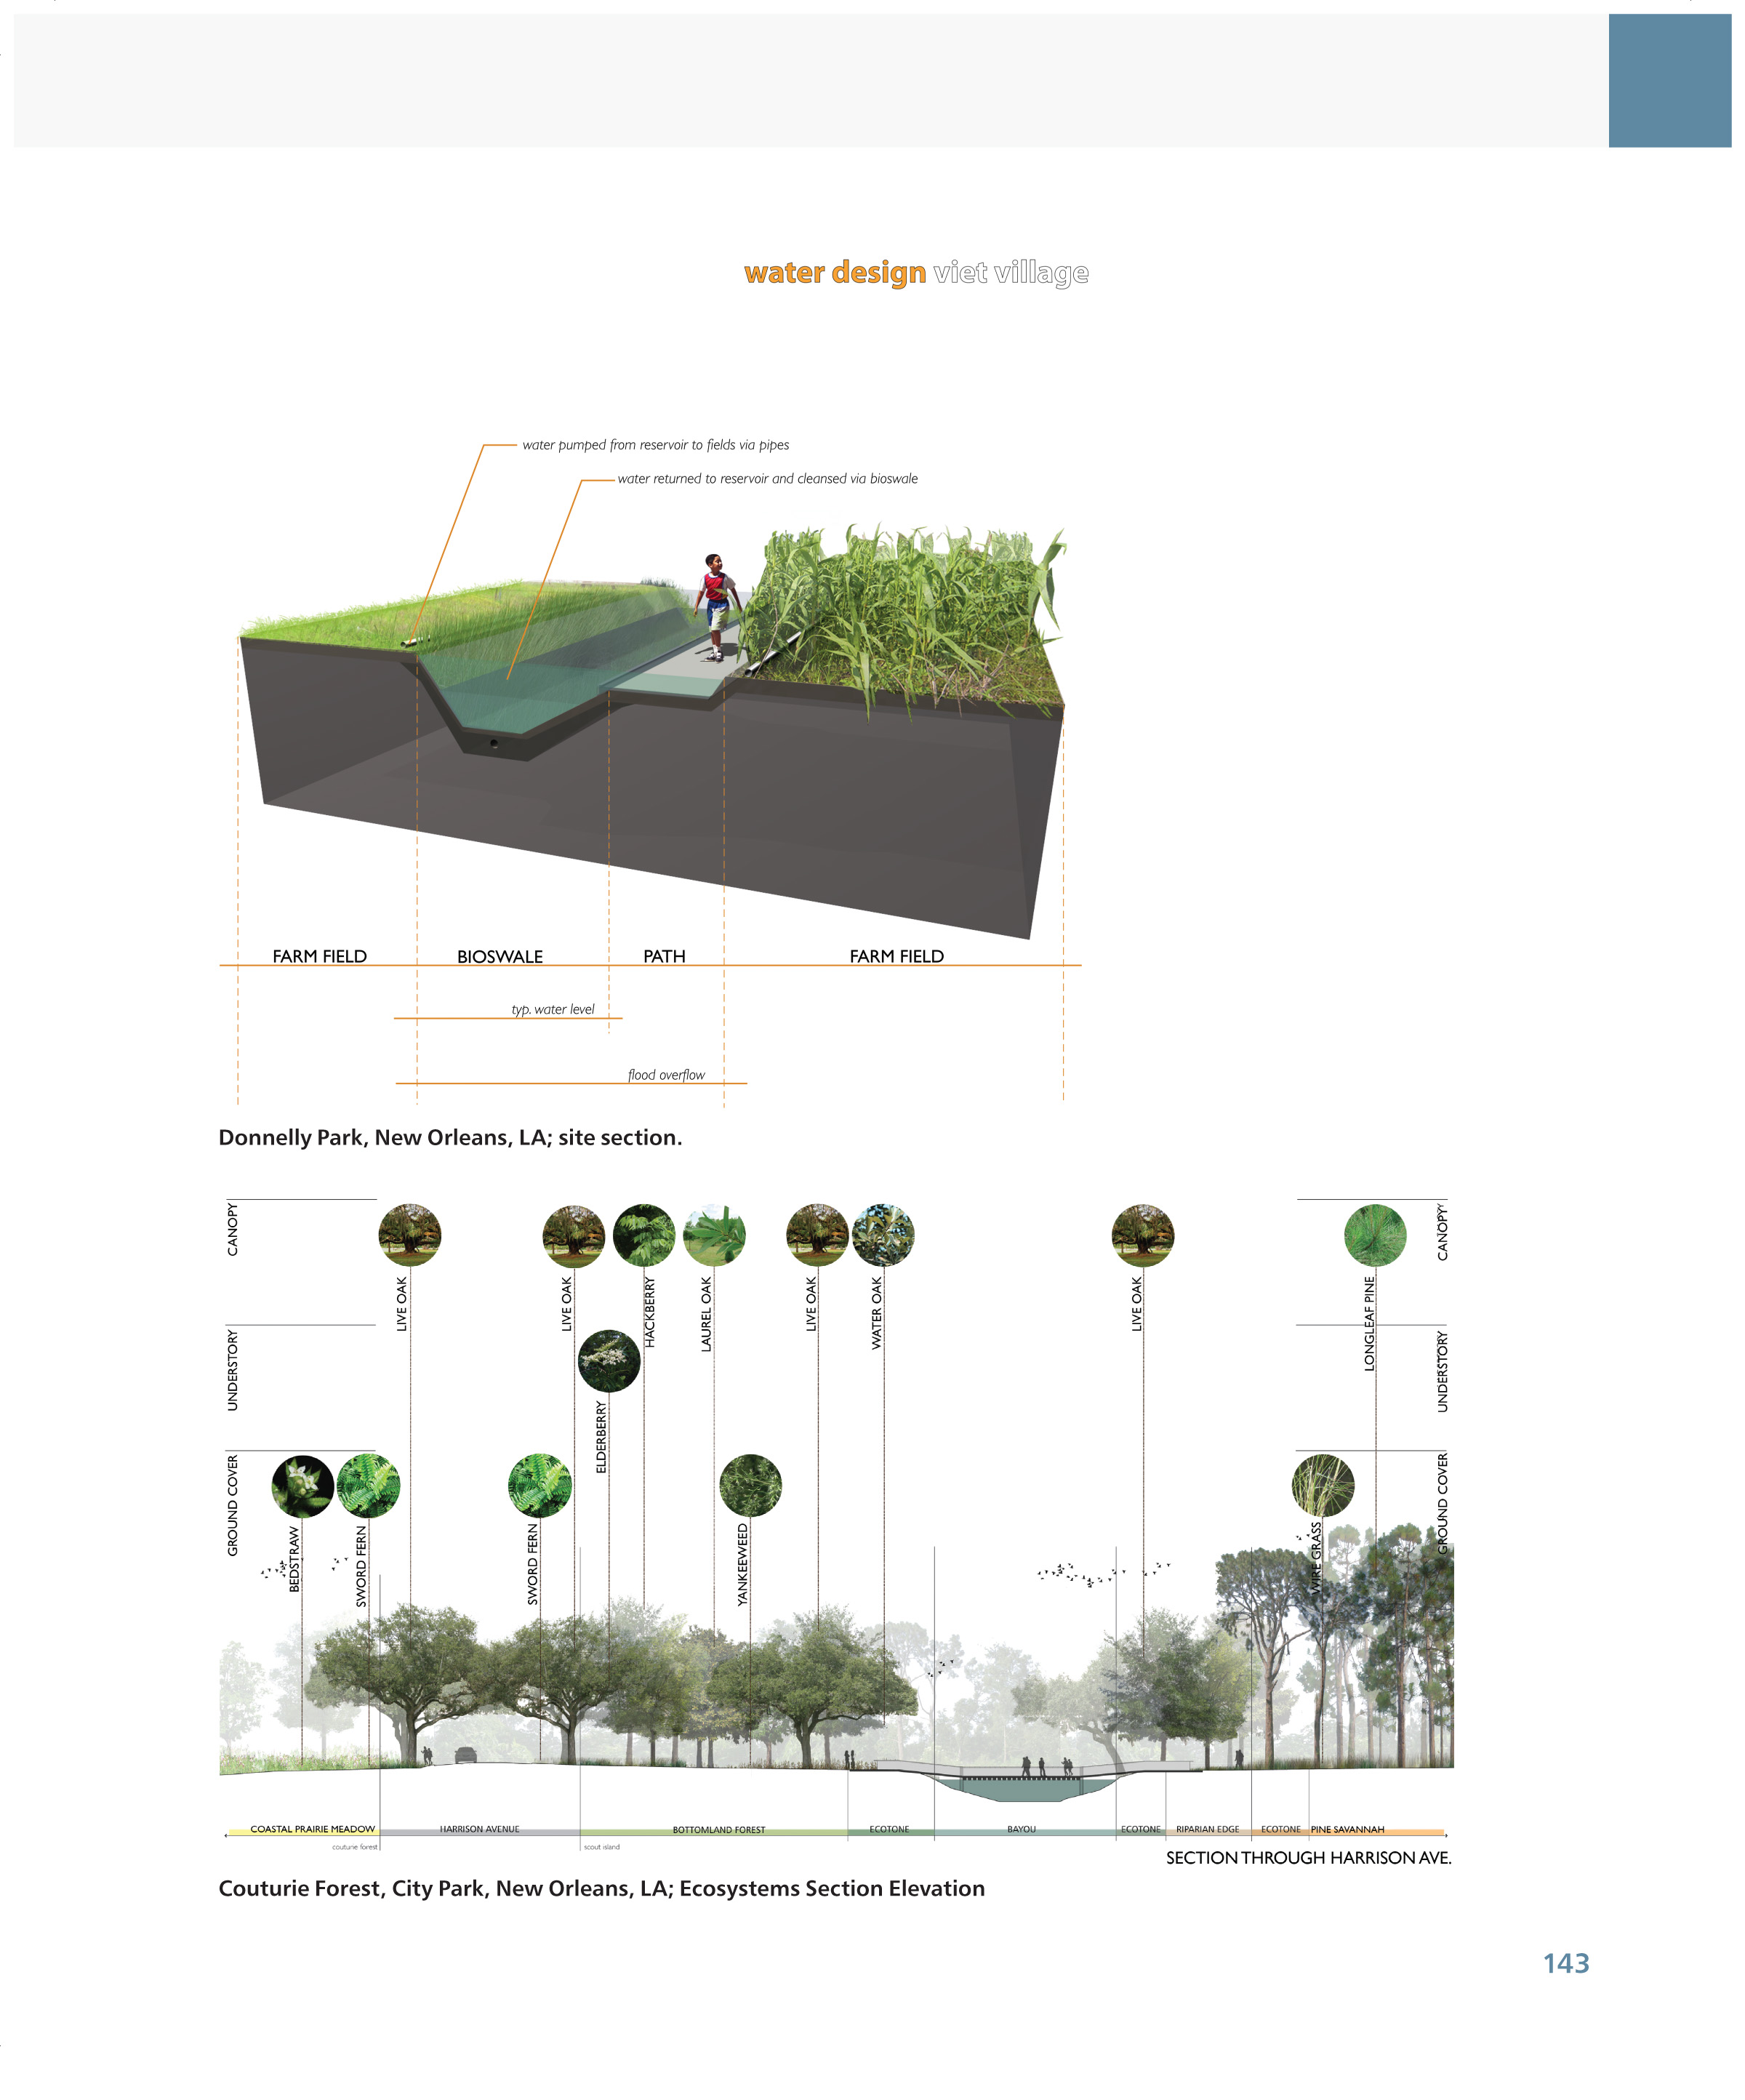 Asla 2012 professional awards digital drawing for landscape download hi res image pooptronica Gallery